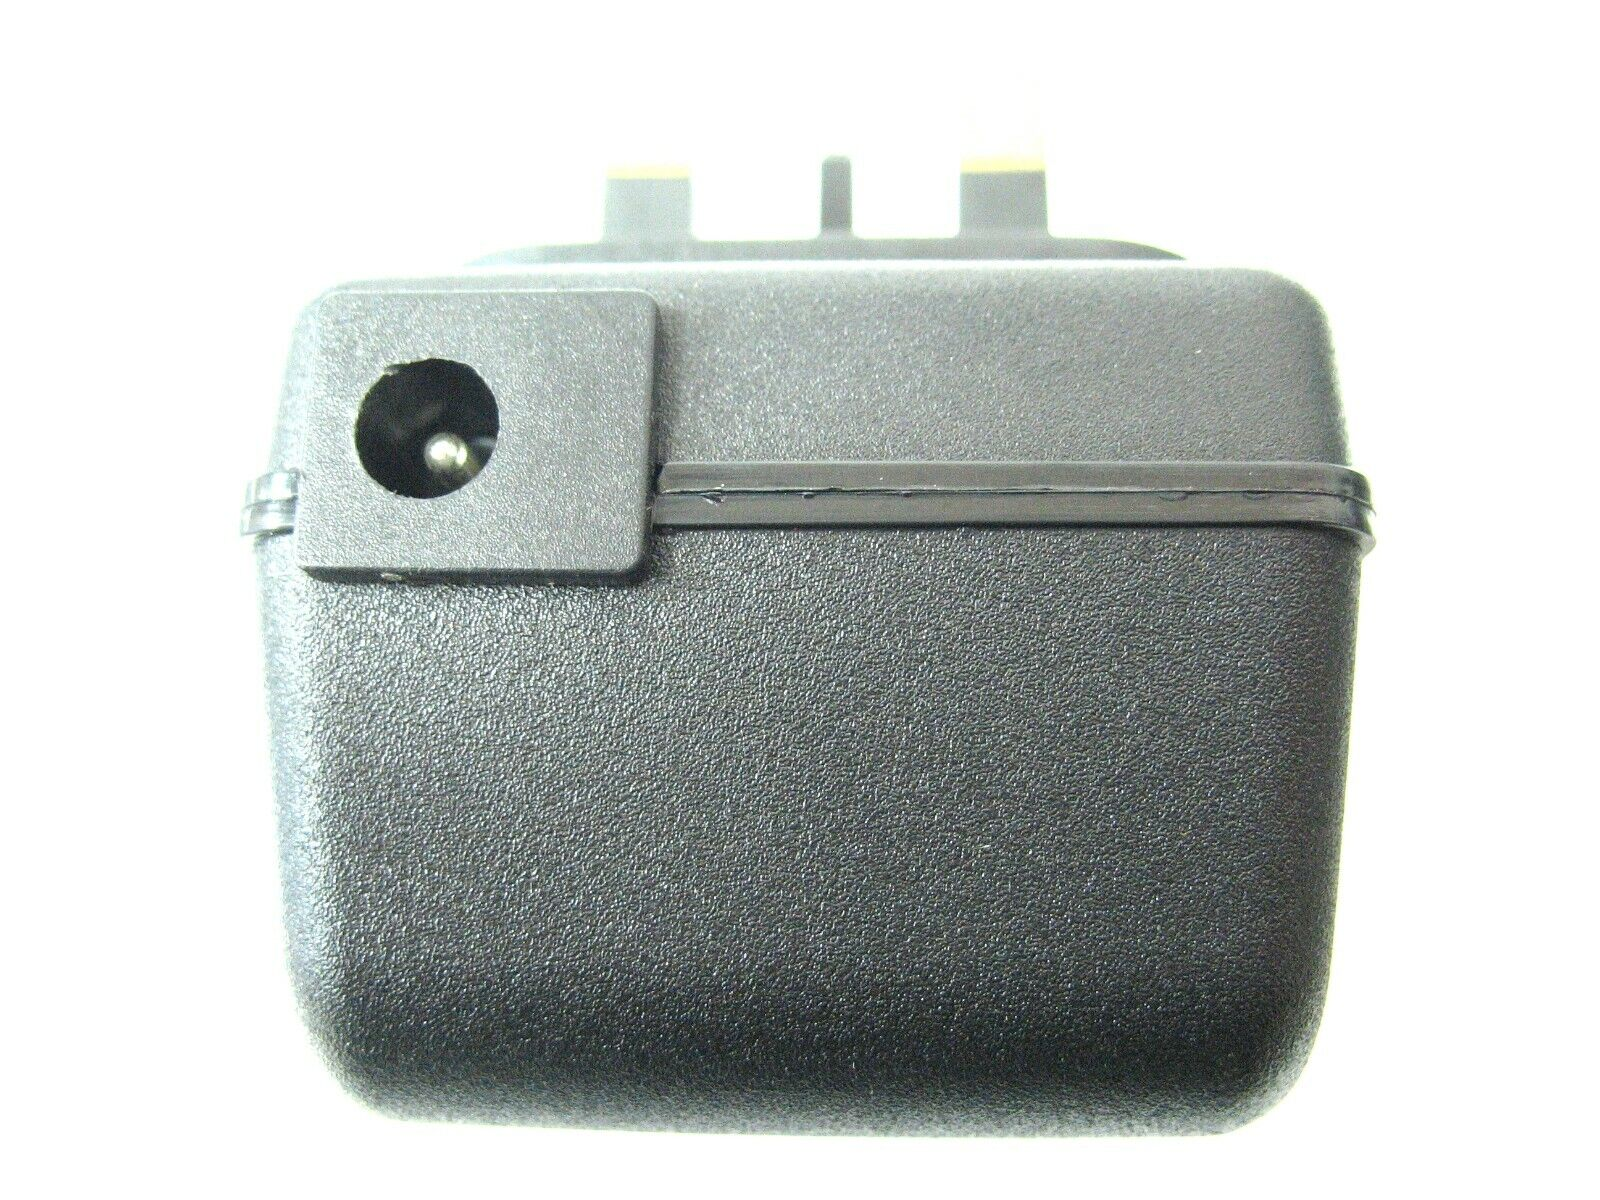 0.1 amp 24 volt Socket AC-AC (AC Output) Power Adaptor/Supply/Charger (2.4 watt)